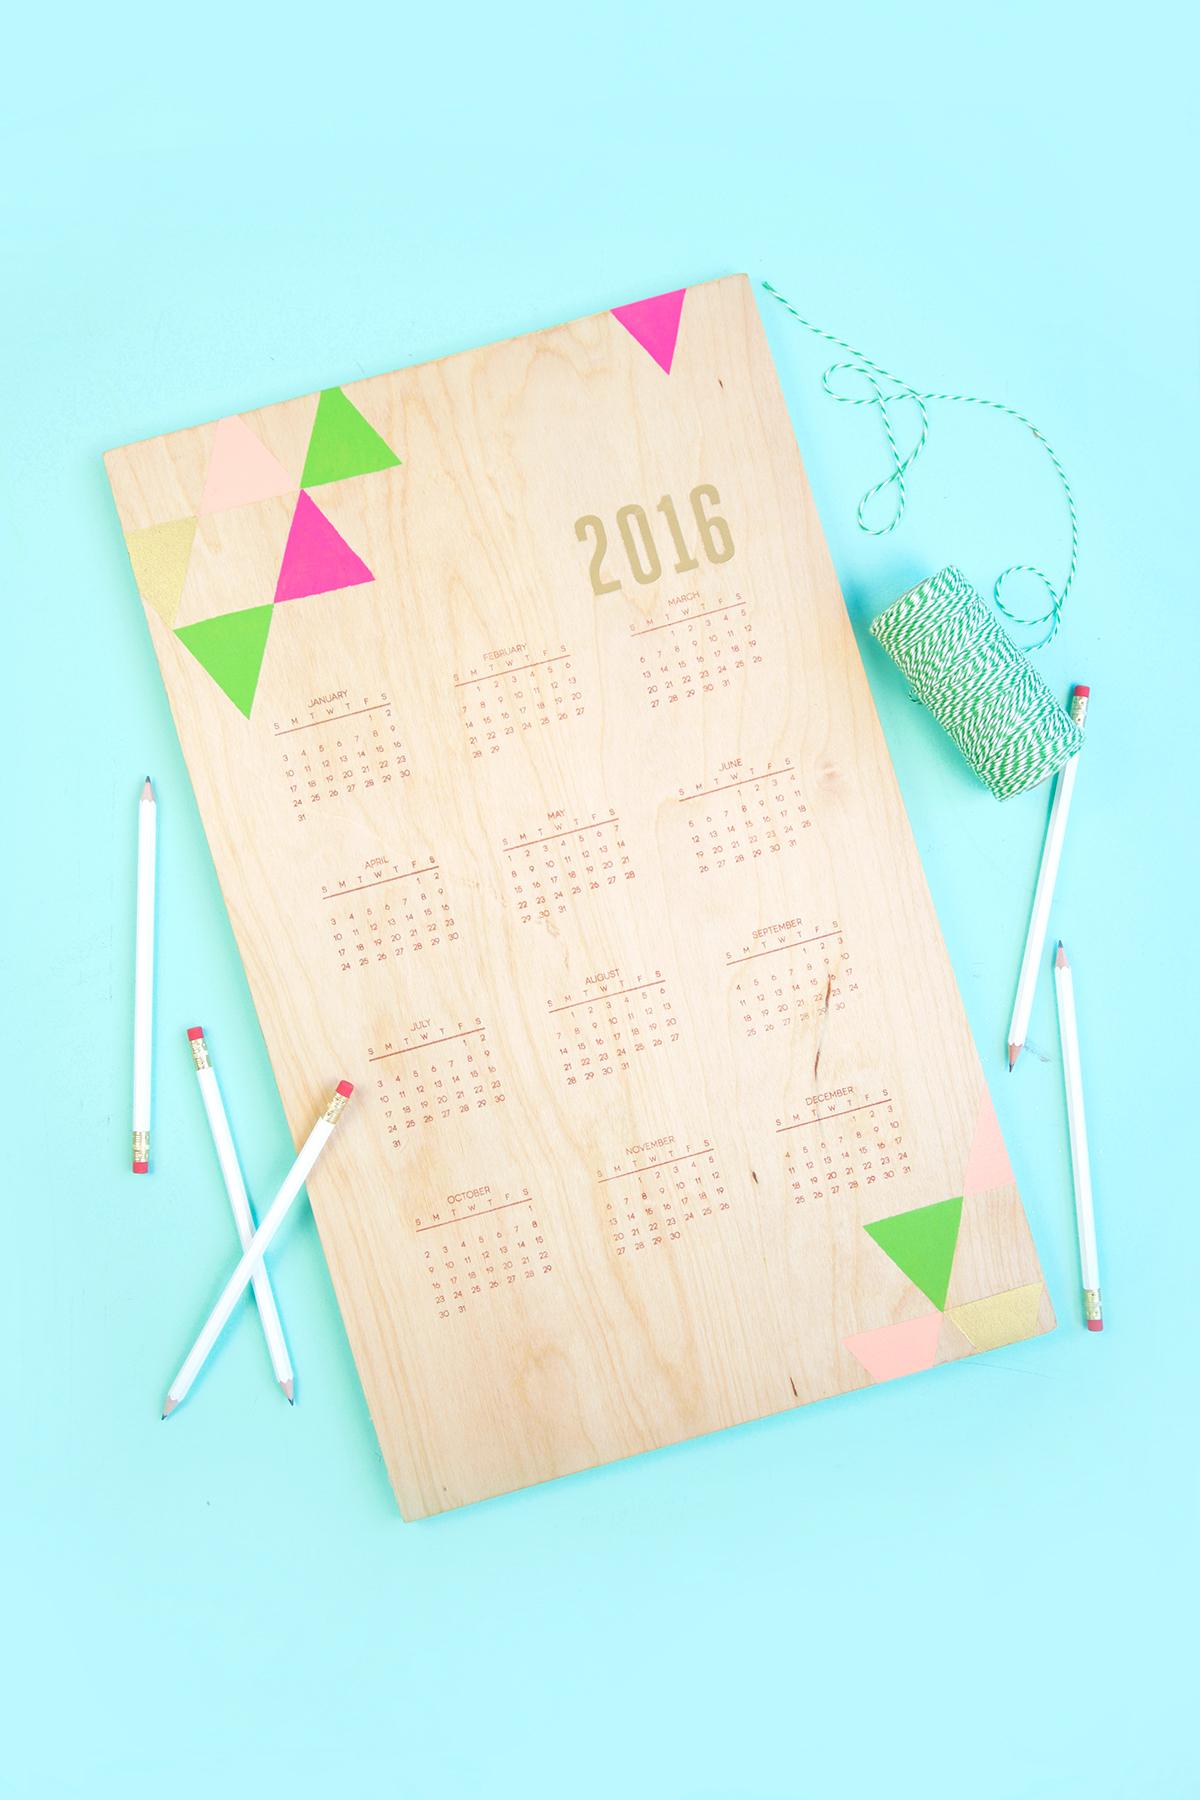 25 handstamped wooden calendar